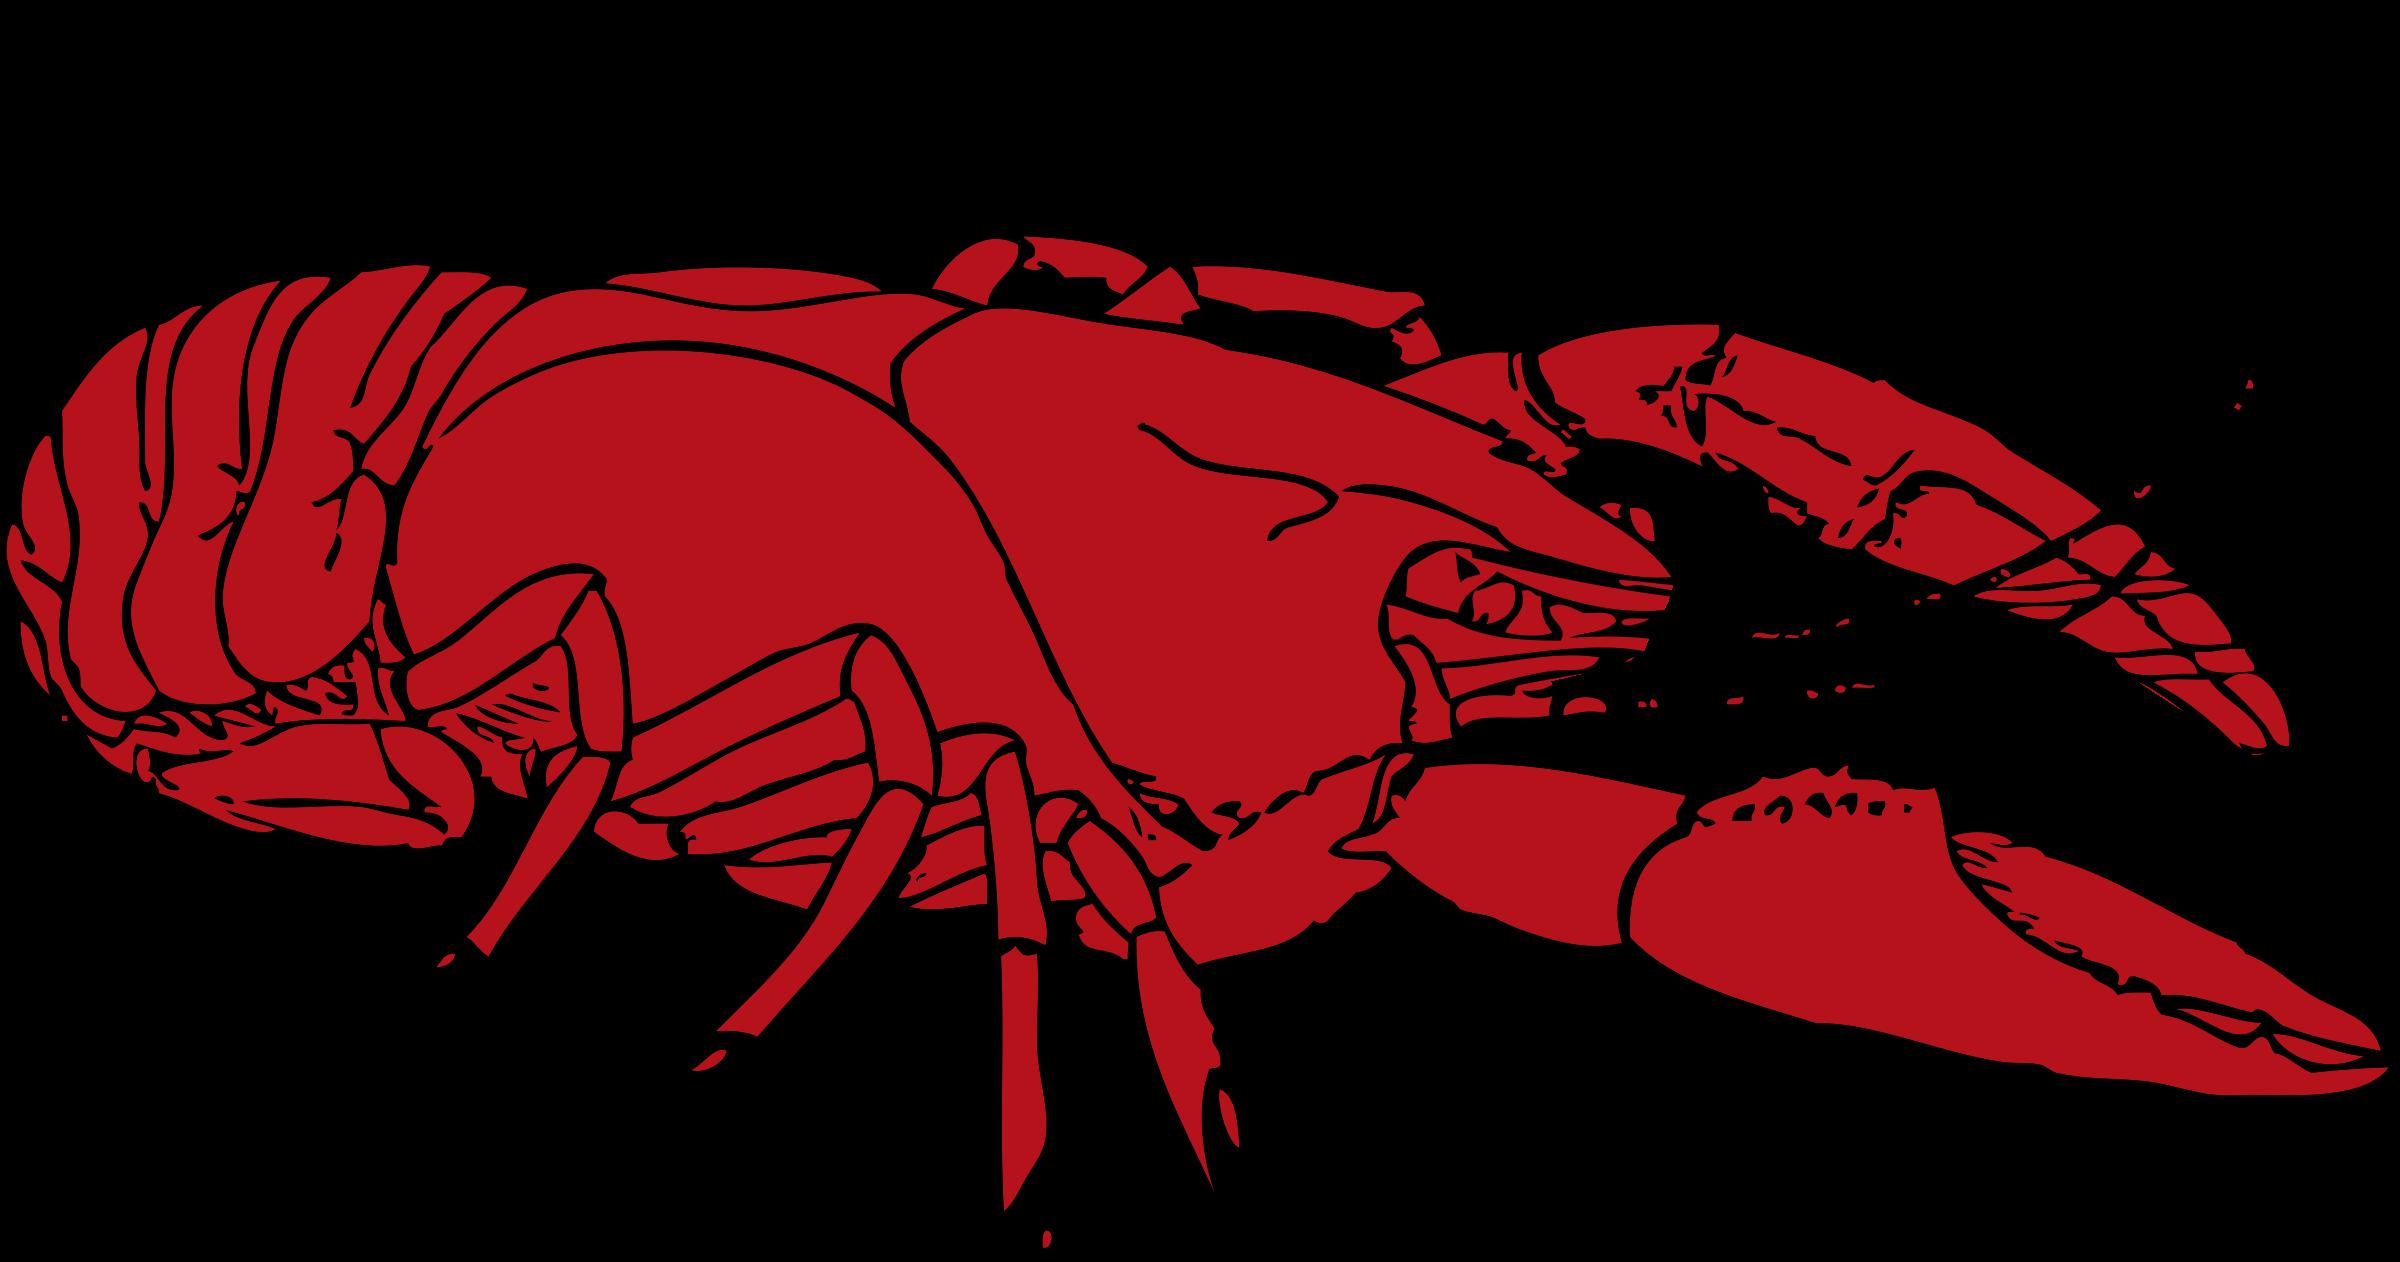 Crawfish clipart file. Crayfish icons png free